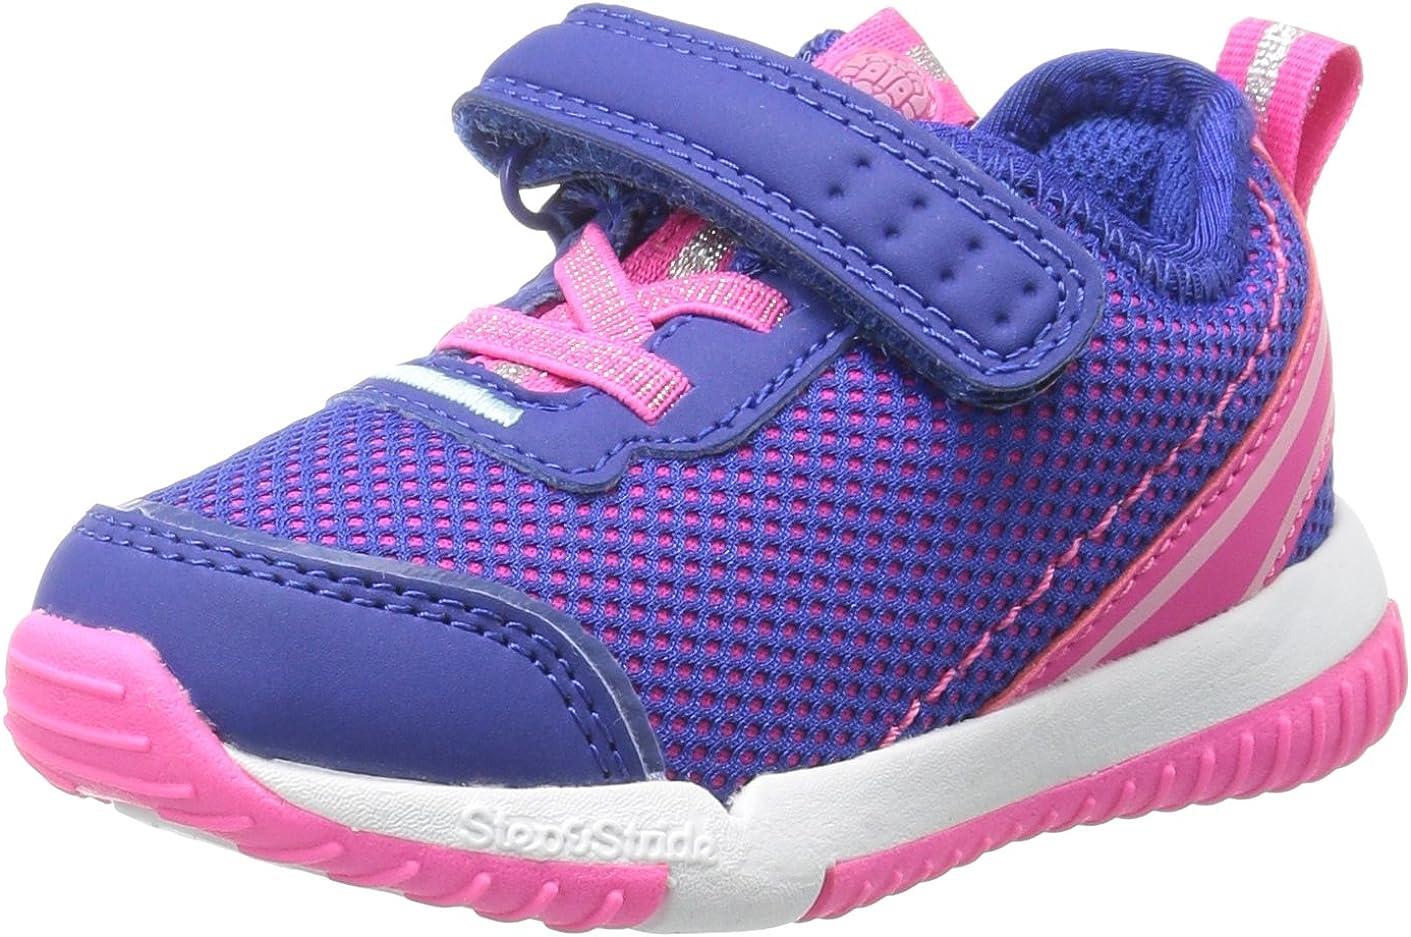 Step  Stride Unisex-Child Girl's Inche Mesh Athletic Sneaker